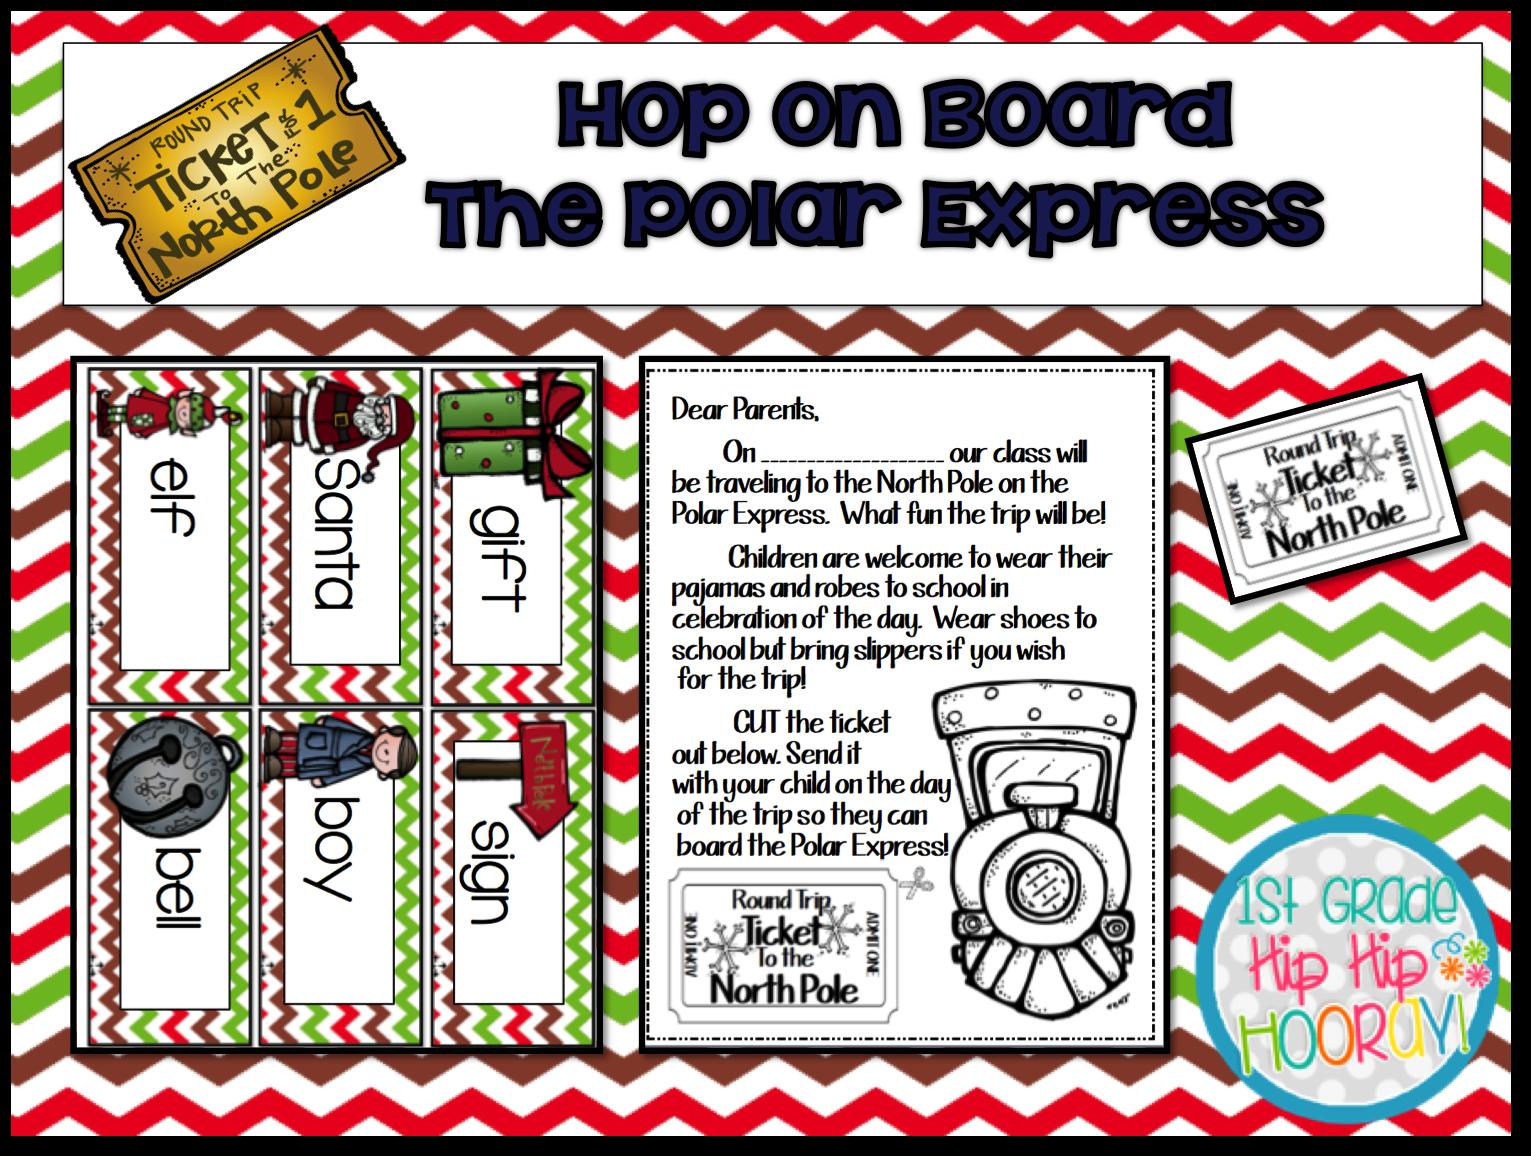 1st Grade Hip Hip Hooray Hop On Board The Polar Express